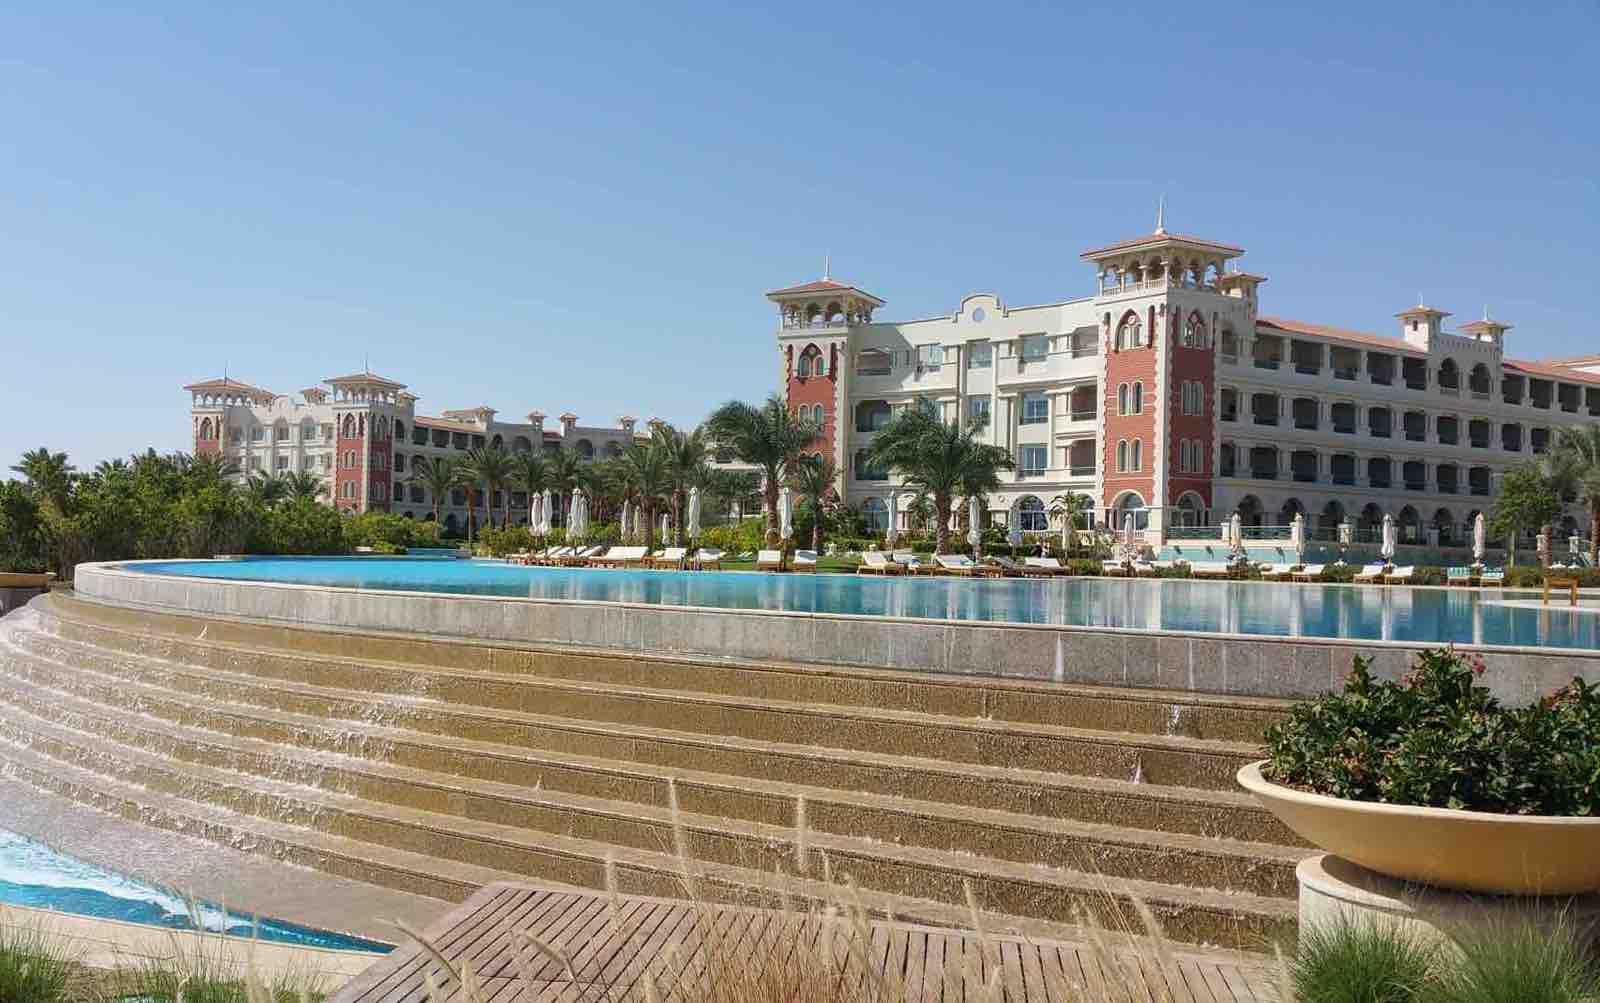 Hotell i særklasse – et palass ved Rødehavet